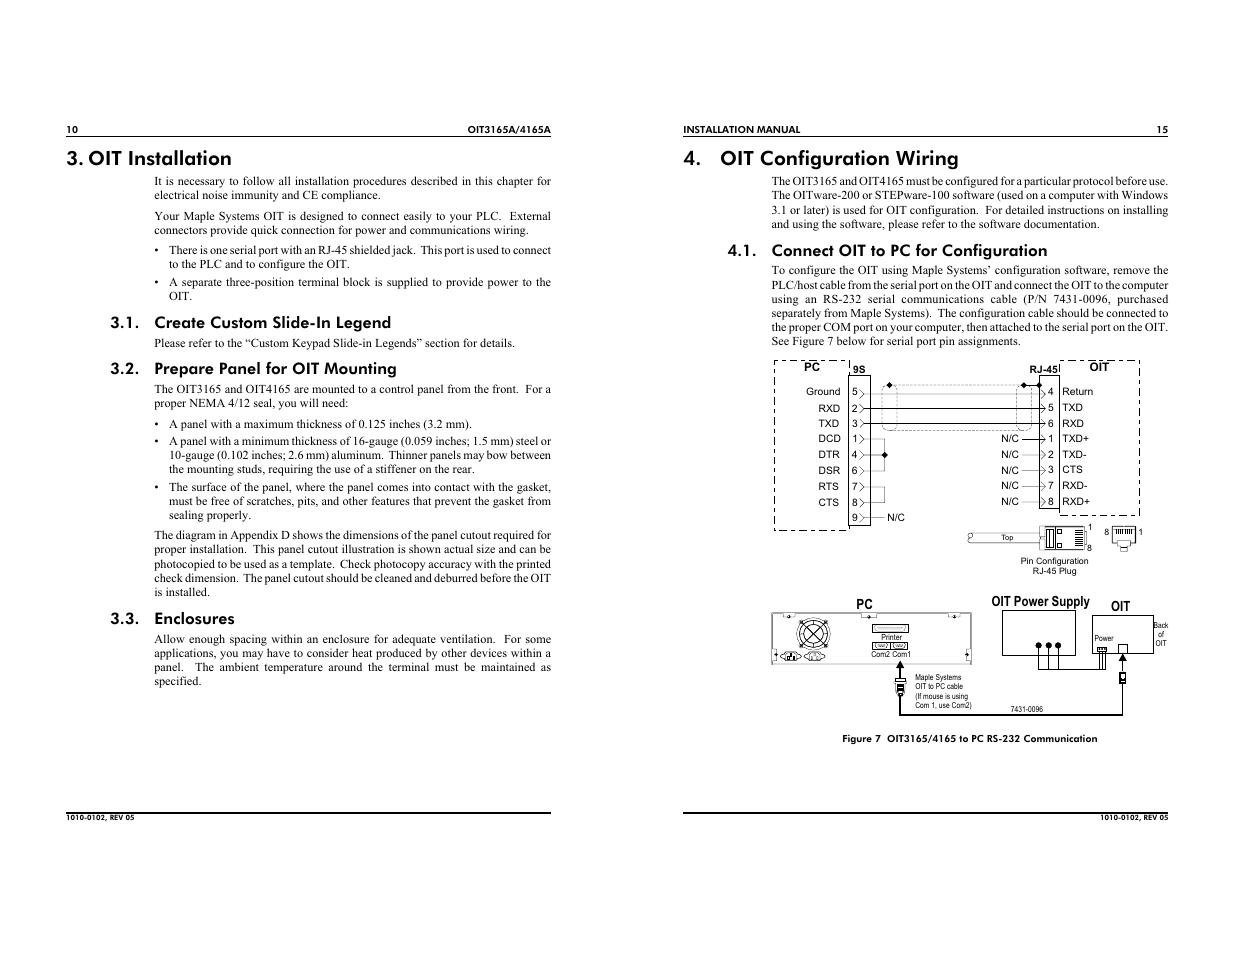 oit installation oit configuration wiring create custom slide in rh manualsdir com